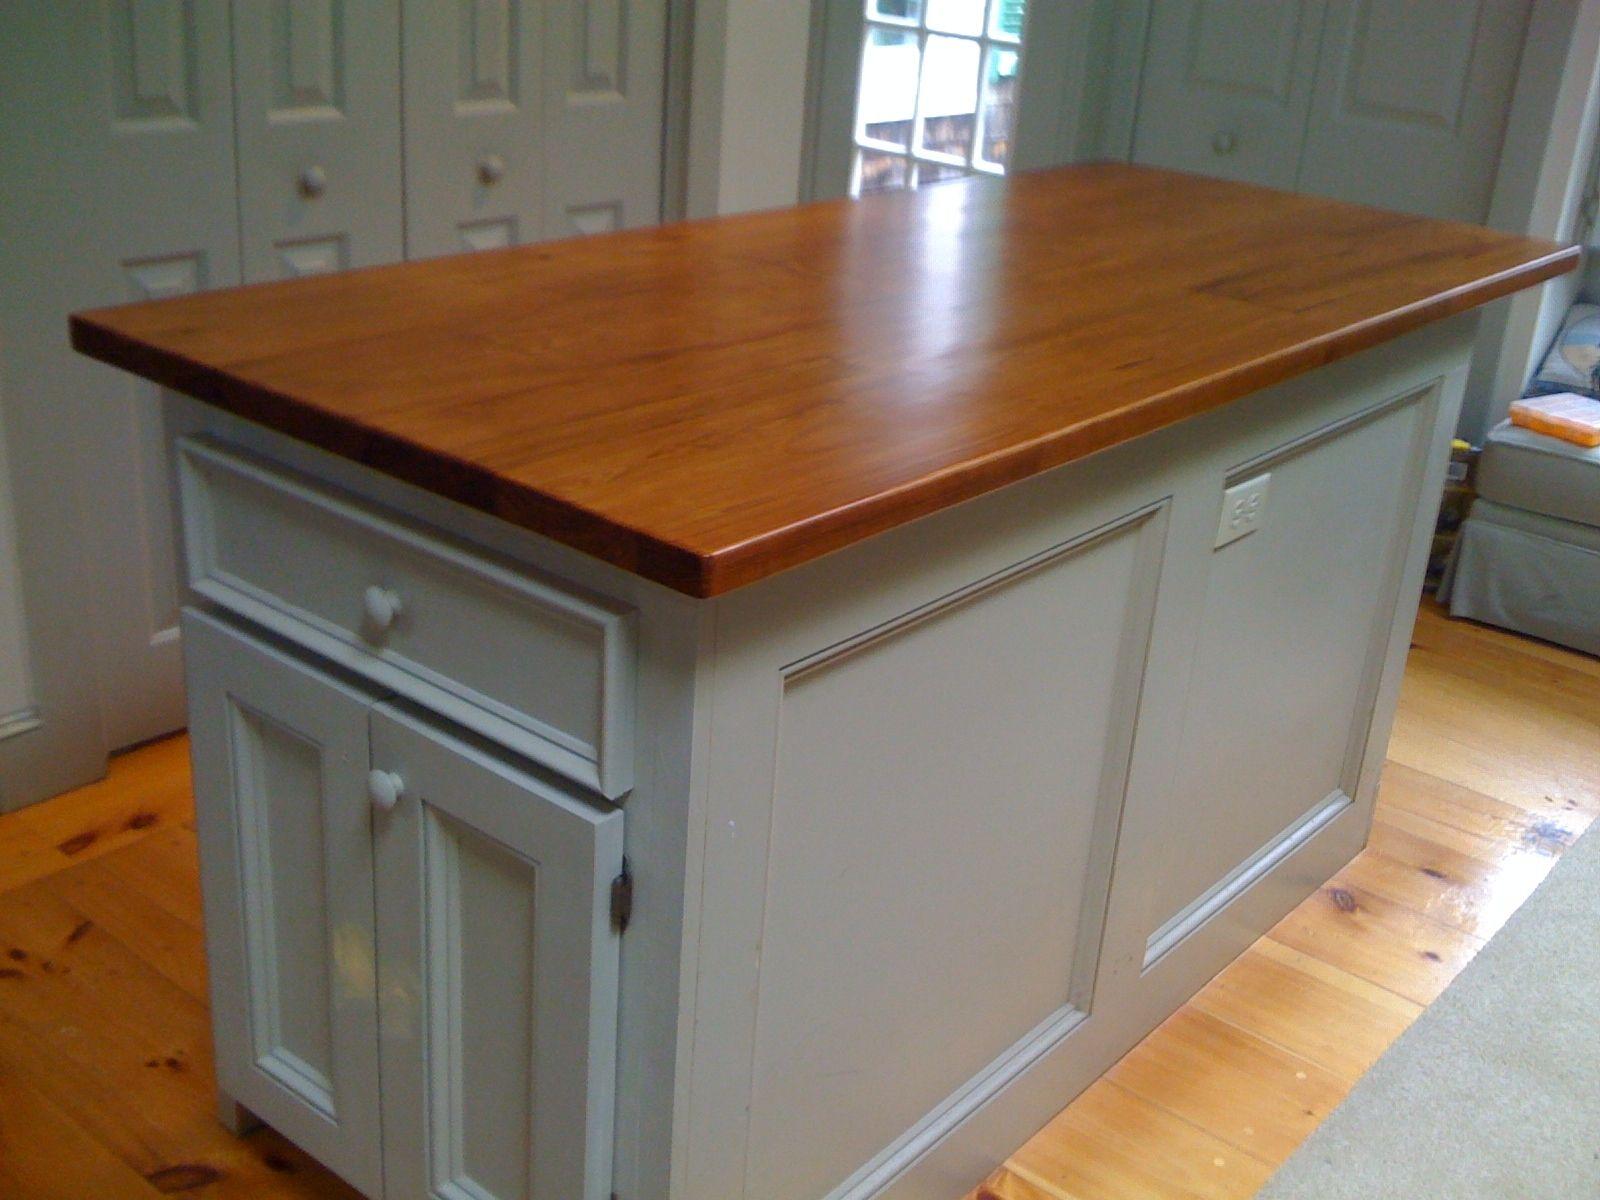 Handmade Custom Kitchen Island Reclaimed Wood Top By Cape